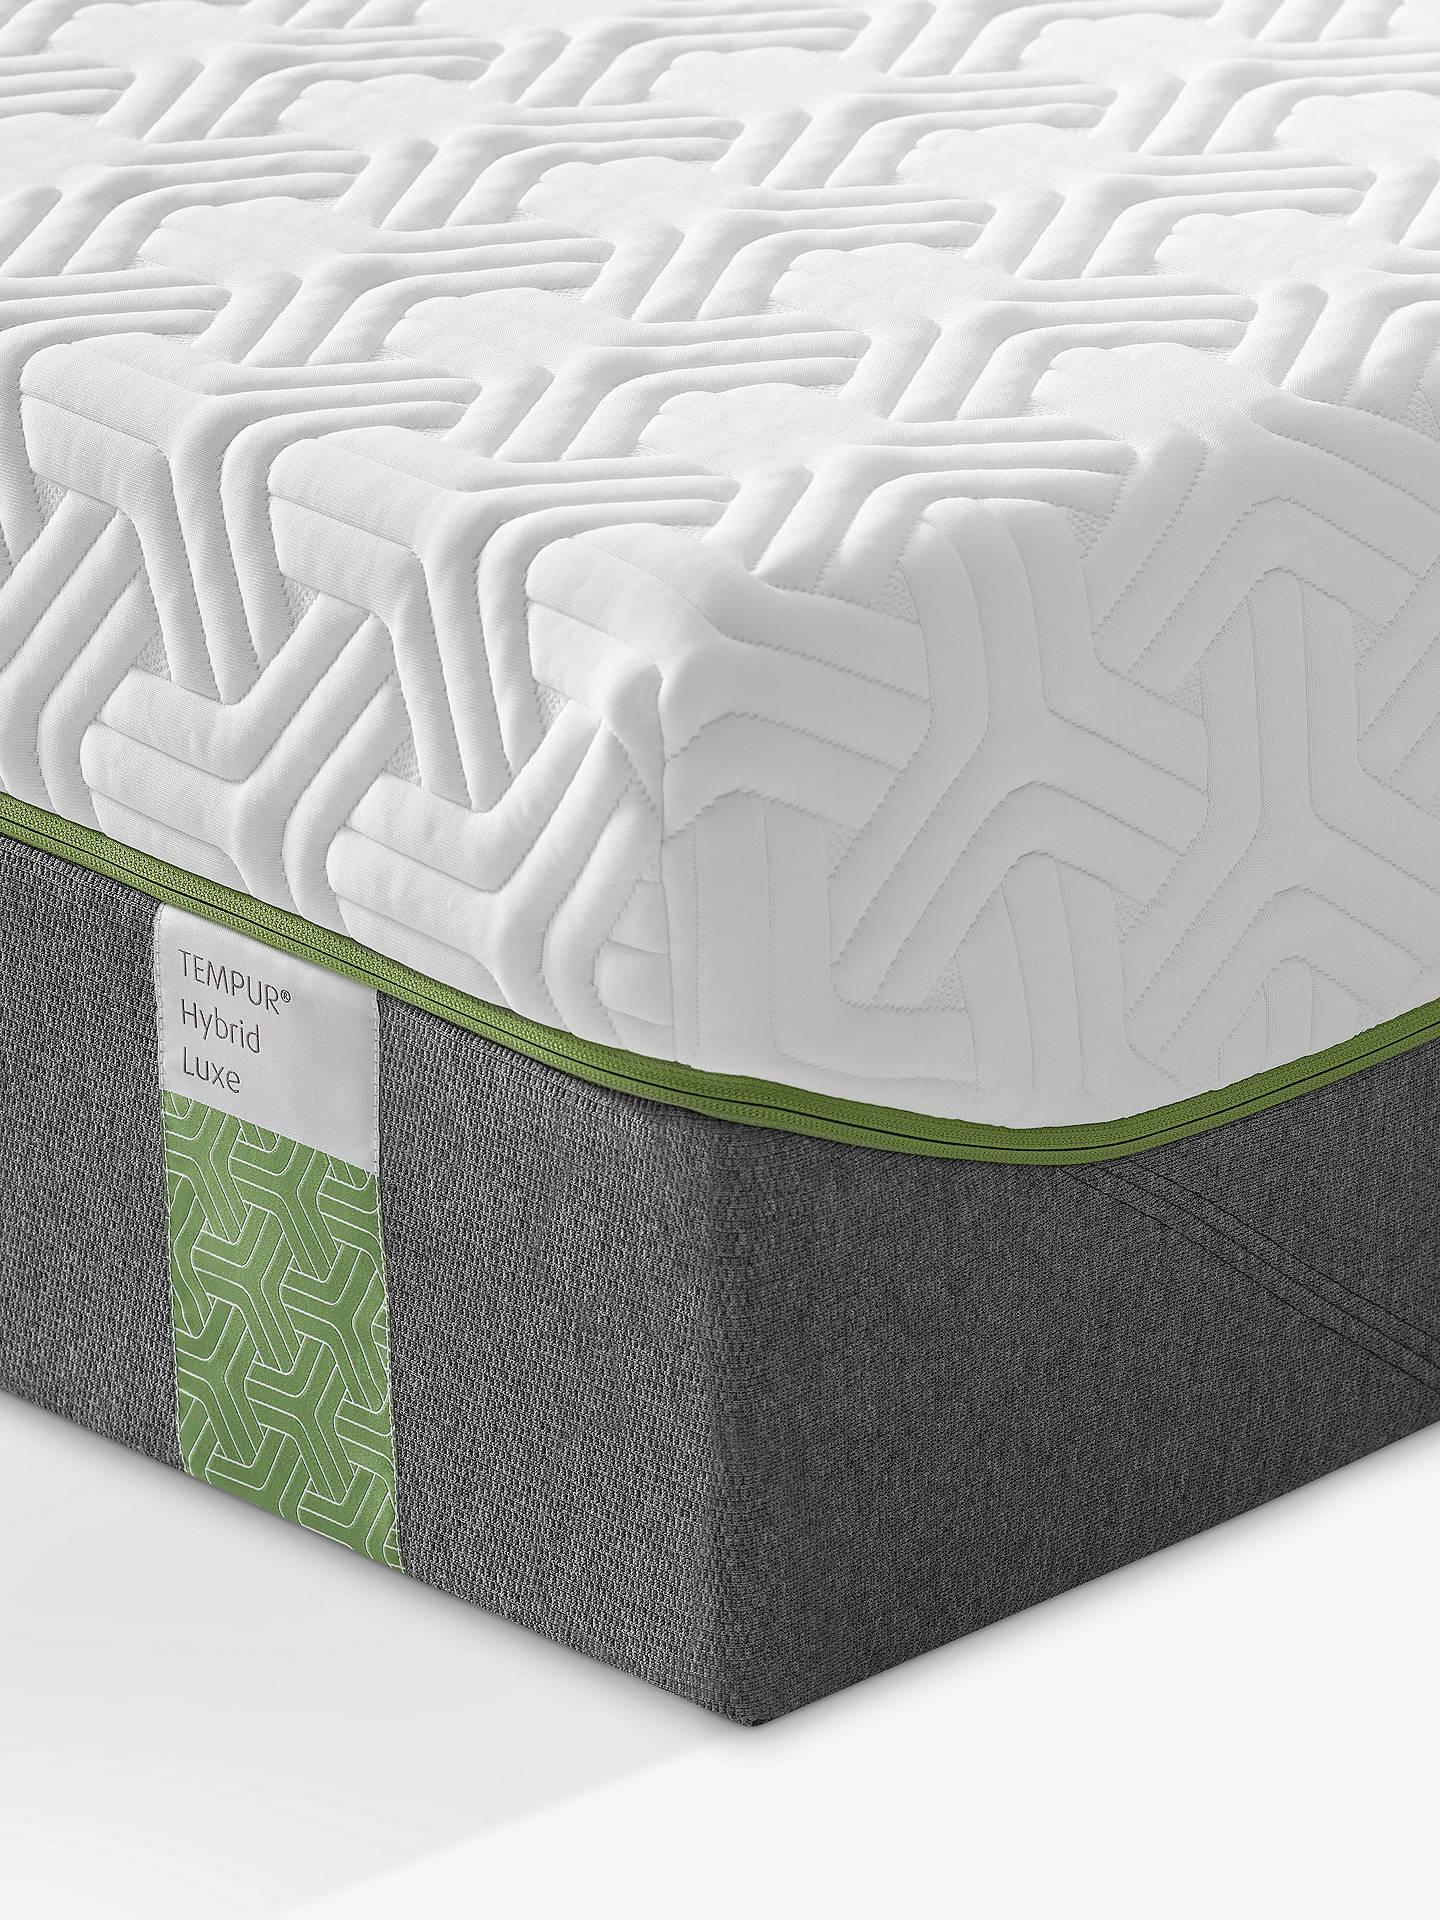 Tempur Hybrid Luxe 30 Pocket Spring Memory Foam Mattress Medium